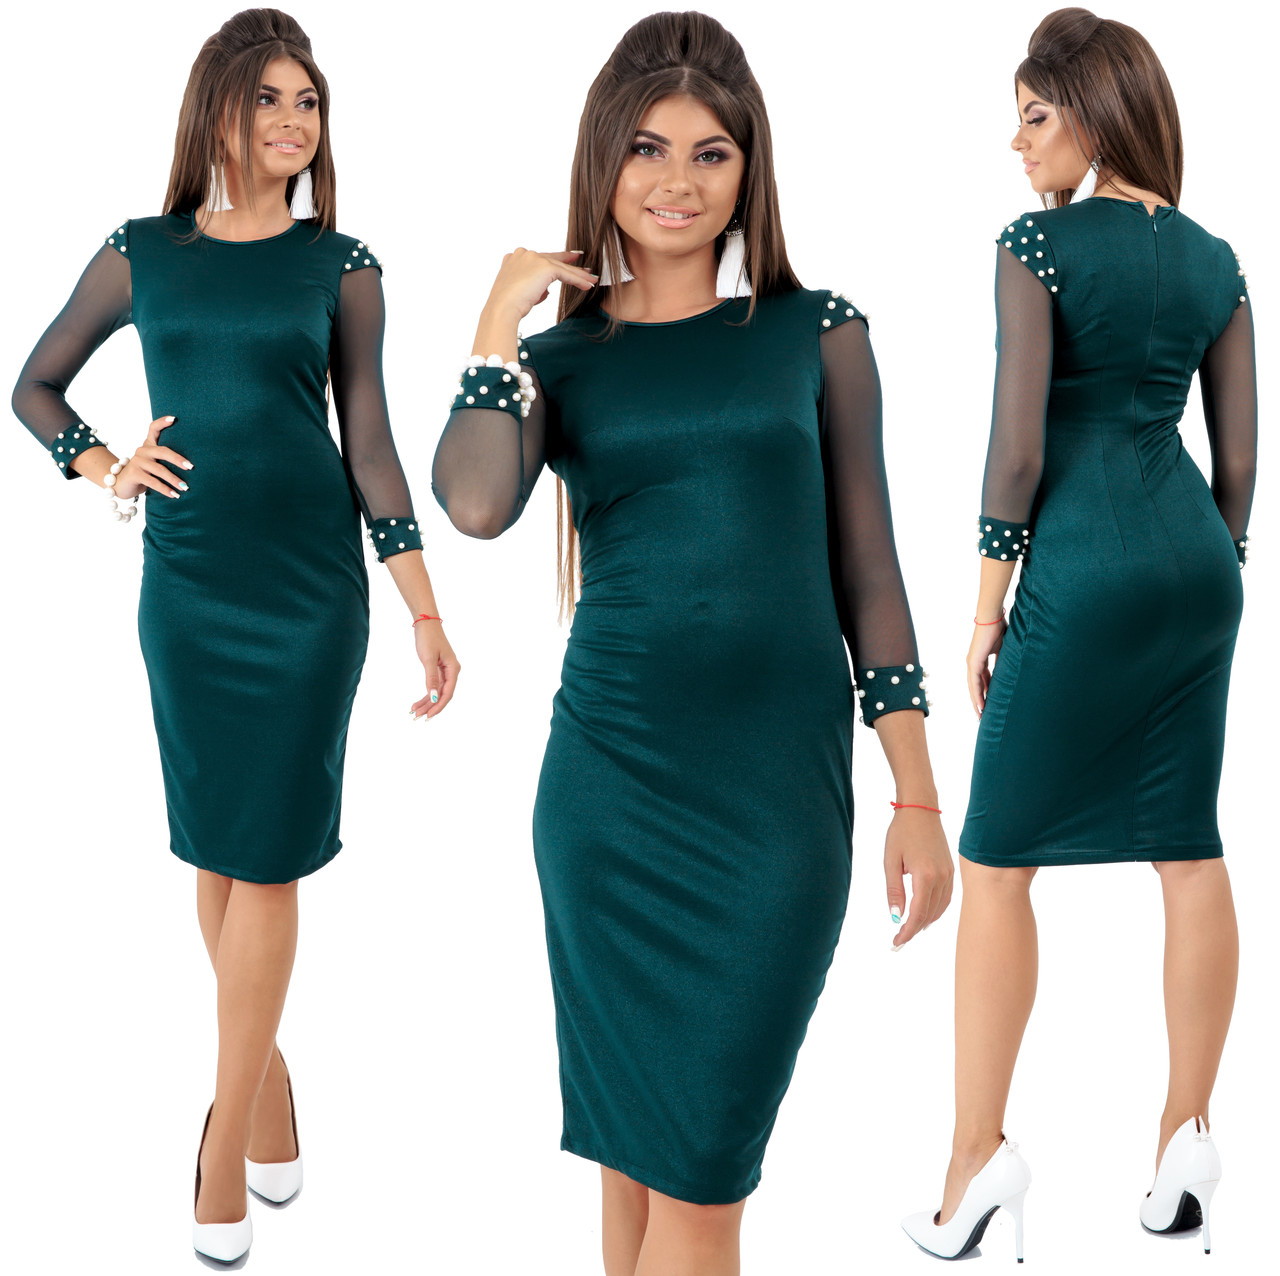 Платье миди  рукав сетка , декор бусинки / 4 цвета арт 6556-92